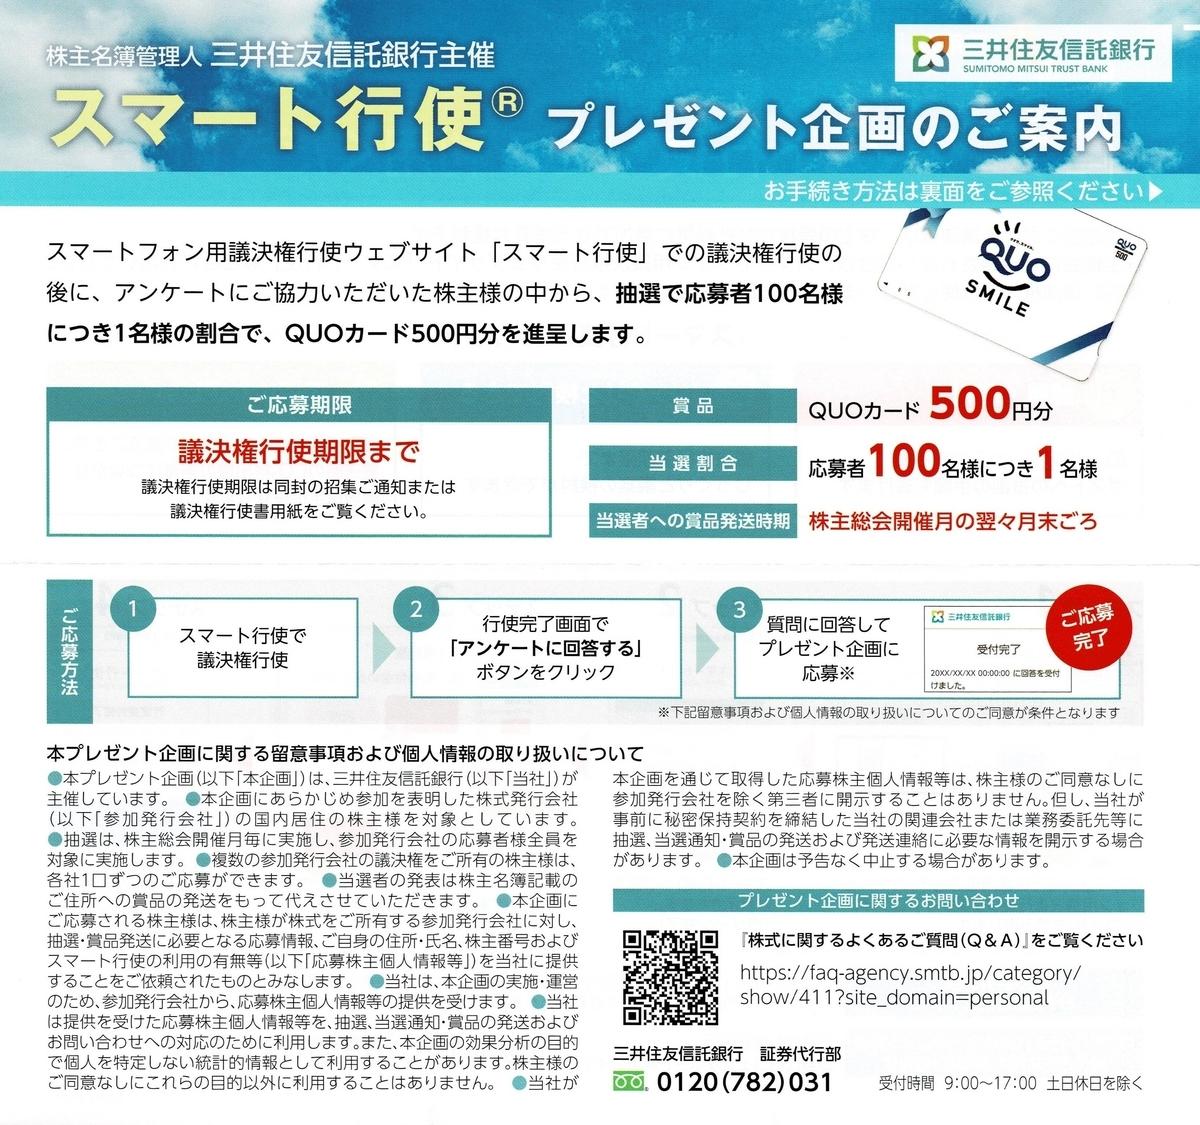 f:id:hanayamatoro:20210610155026j:plain